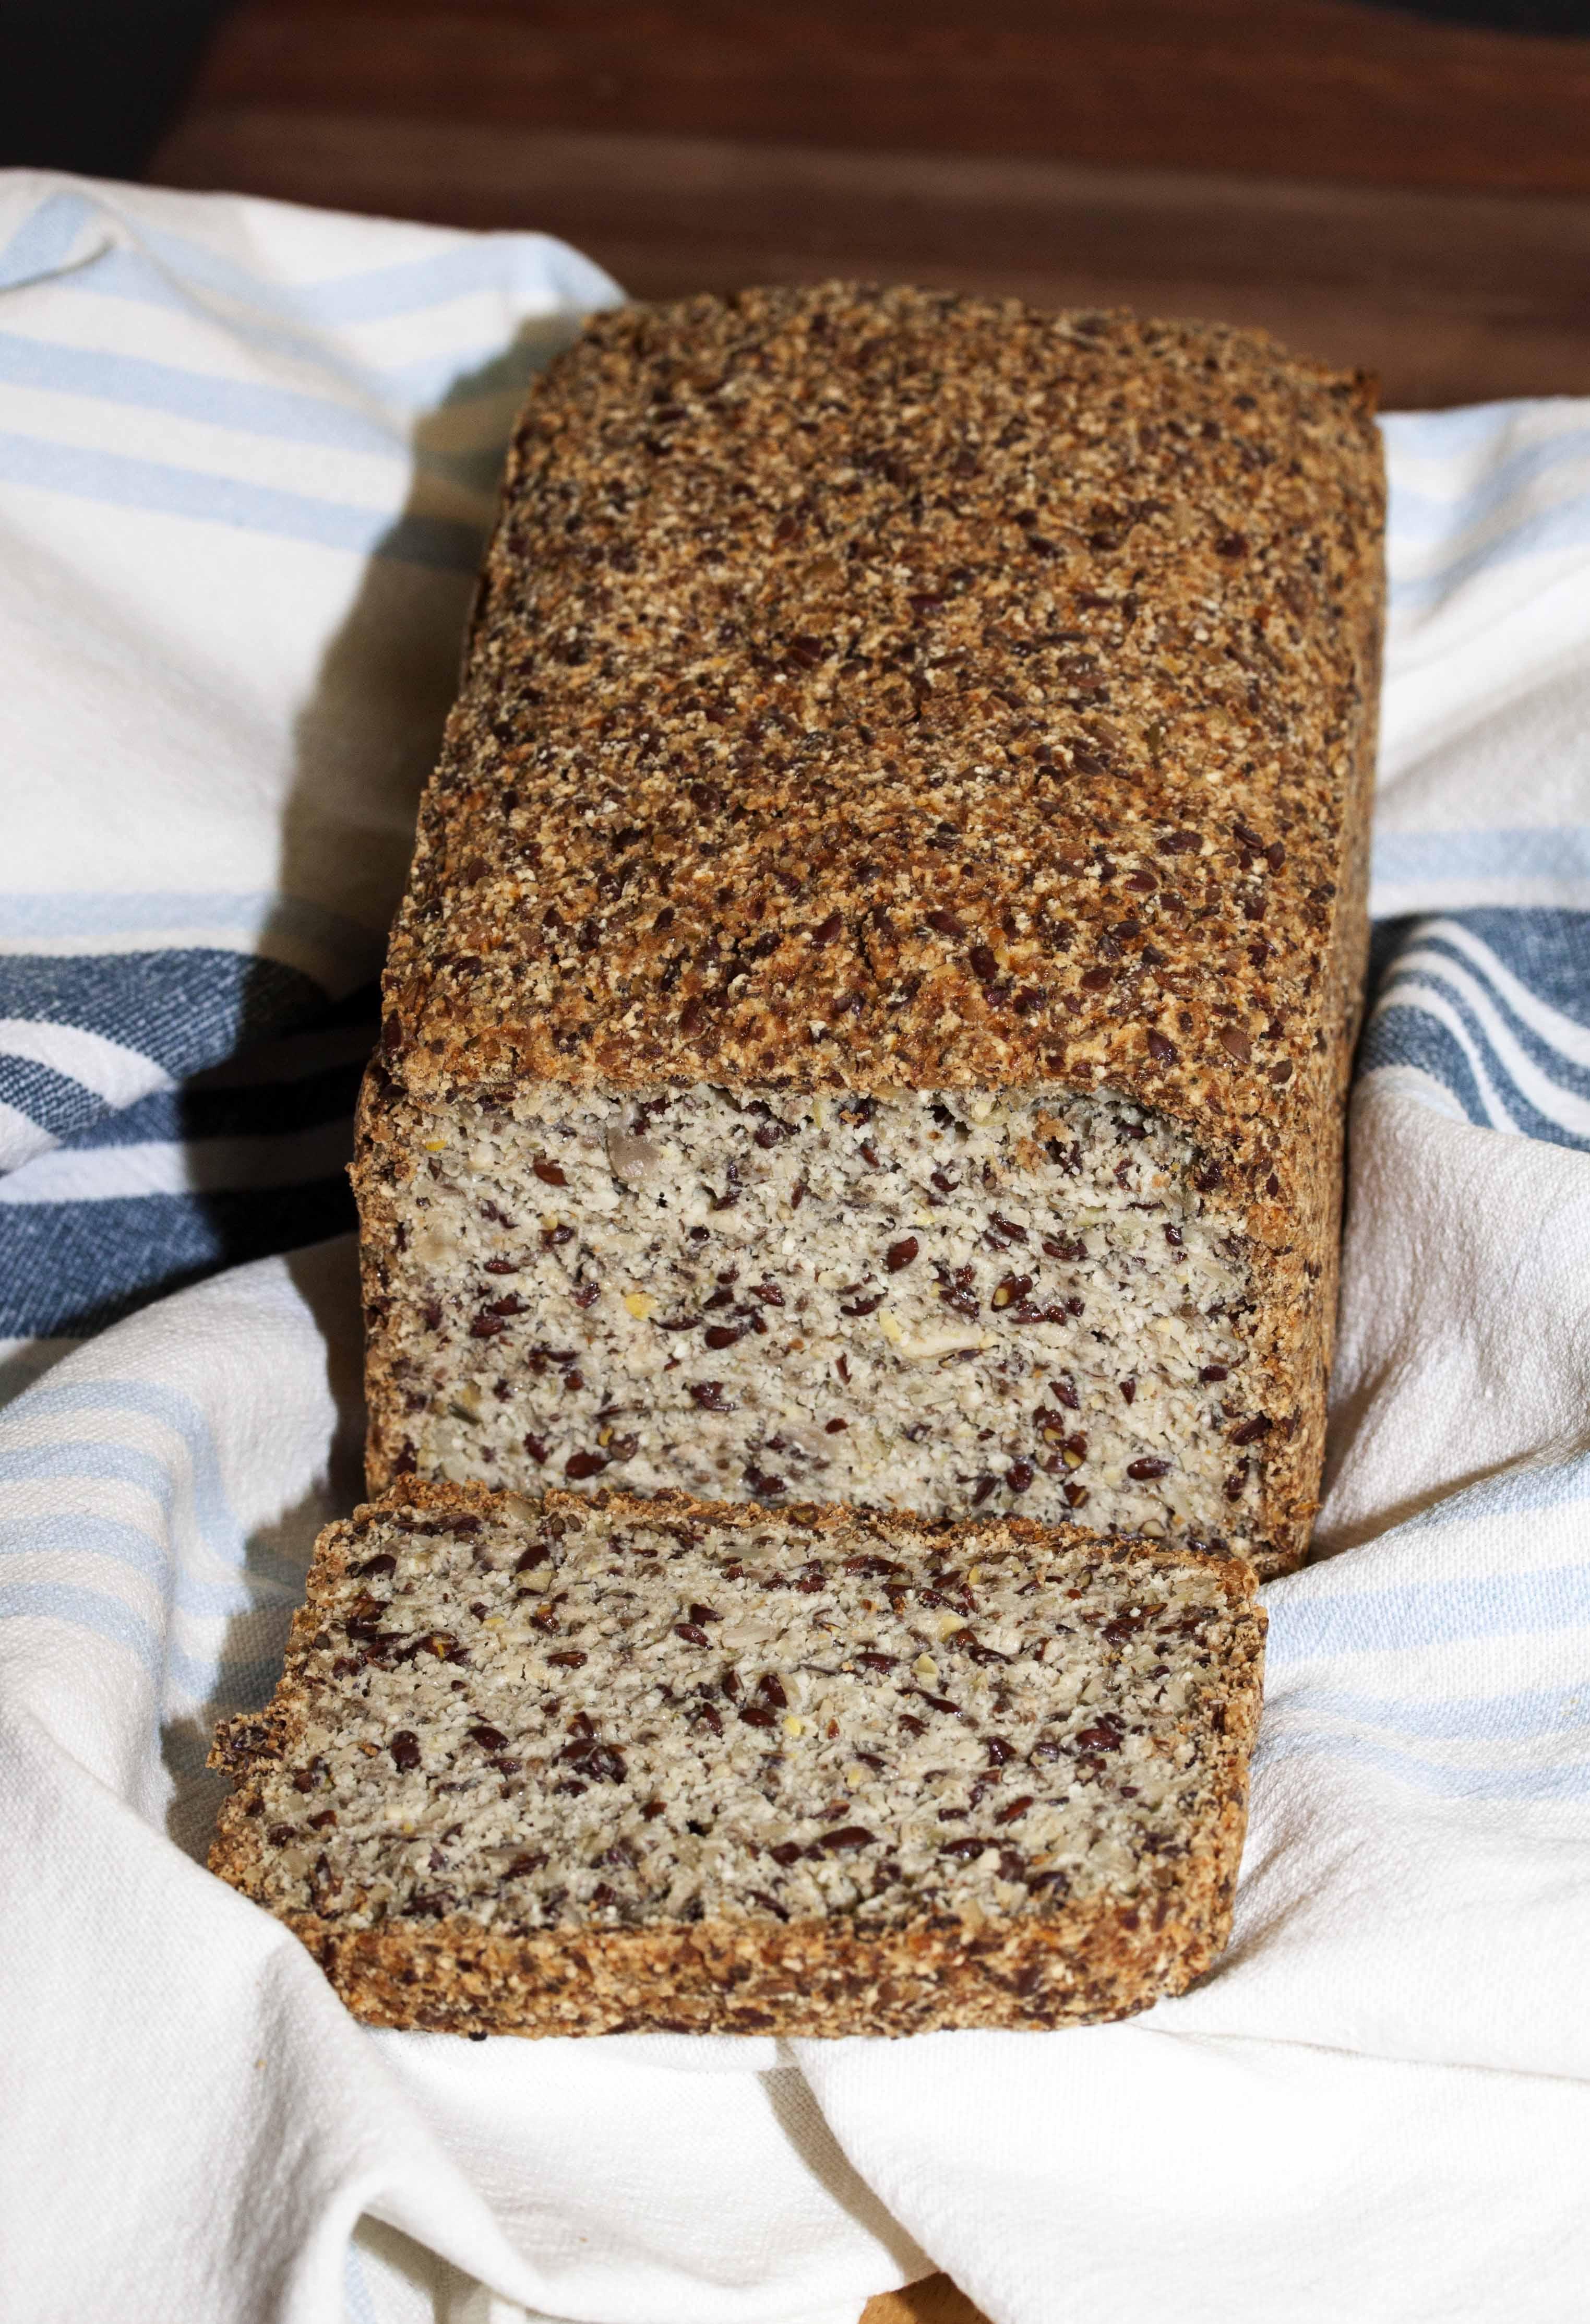 Vegan Paleo Yeast Bread